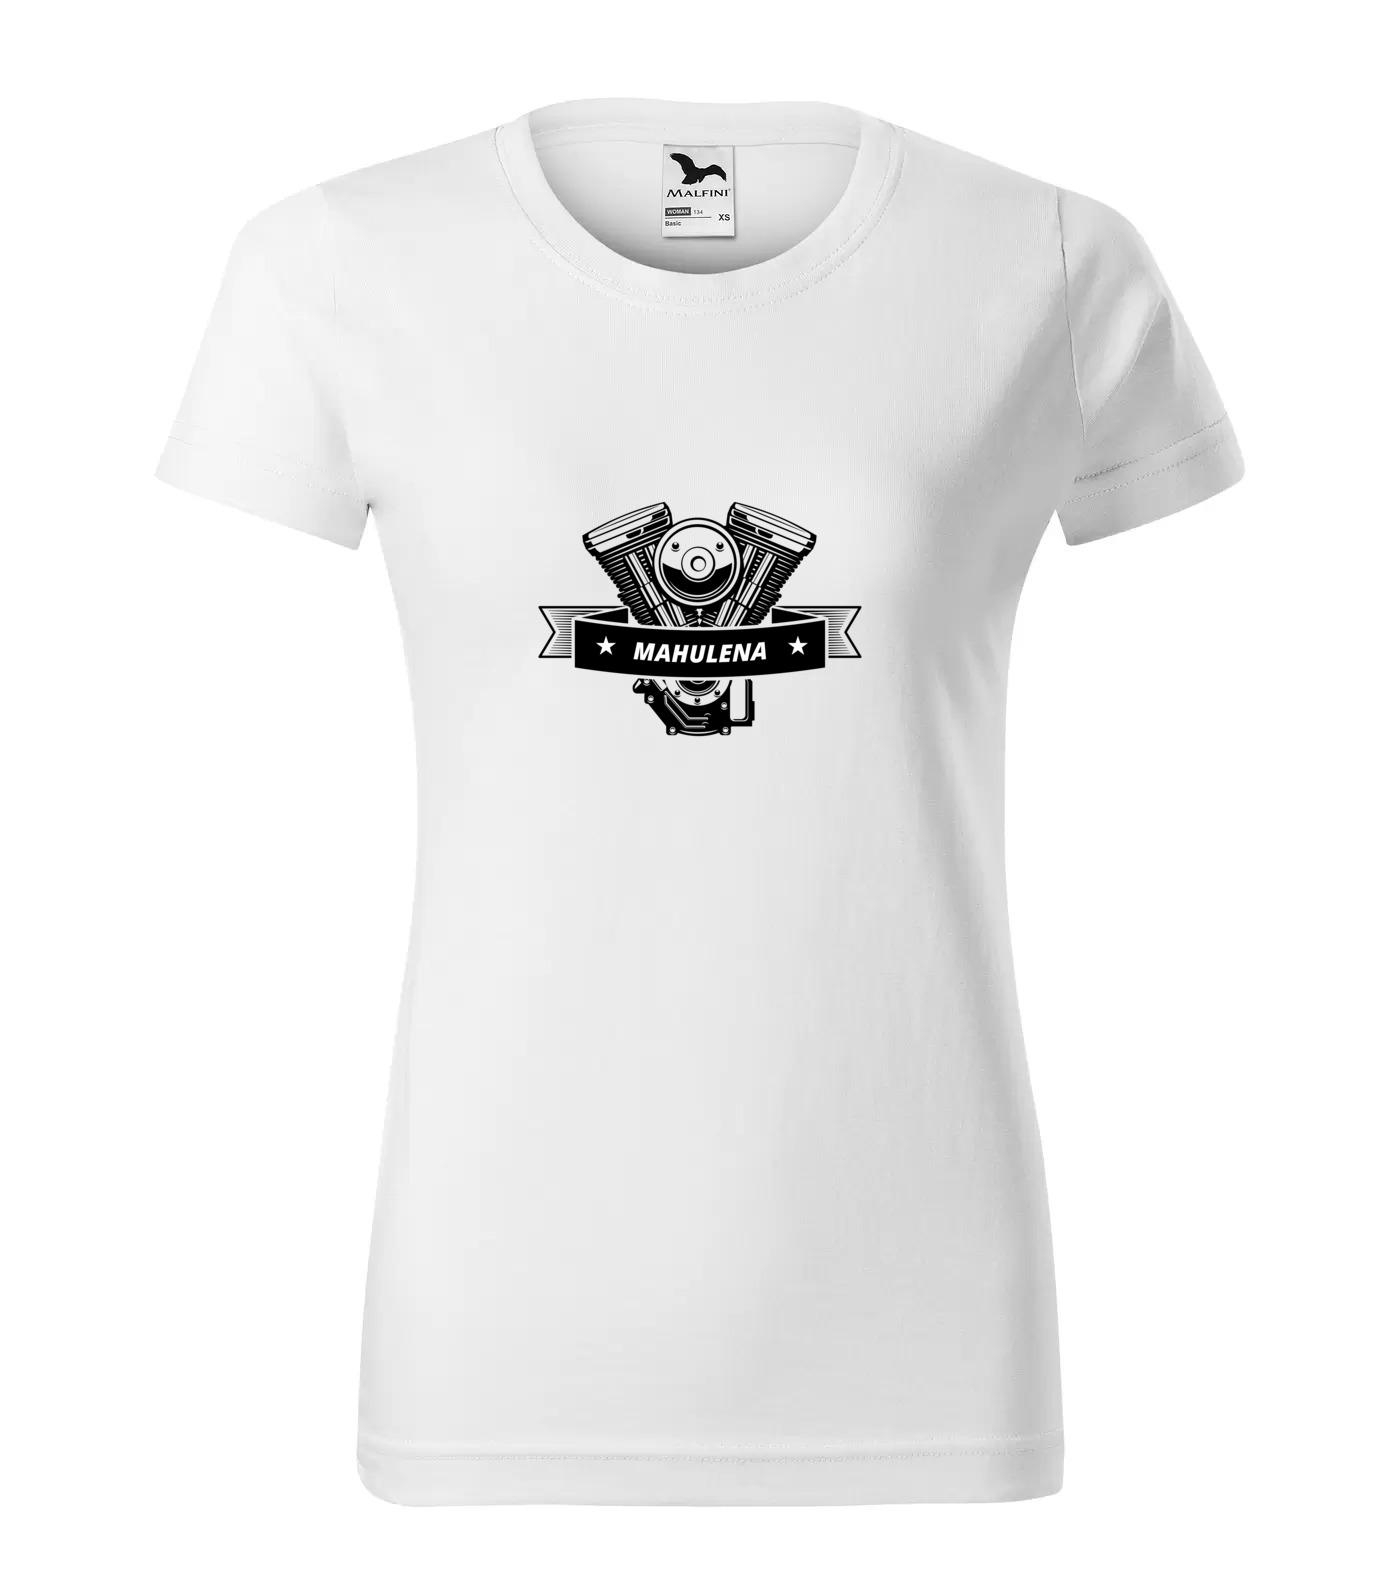 Tričko Motorkářka Mahulena